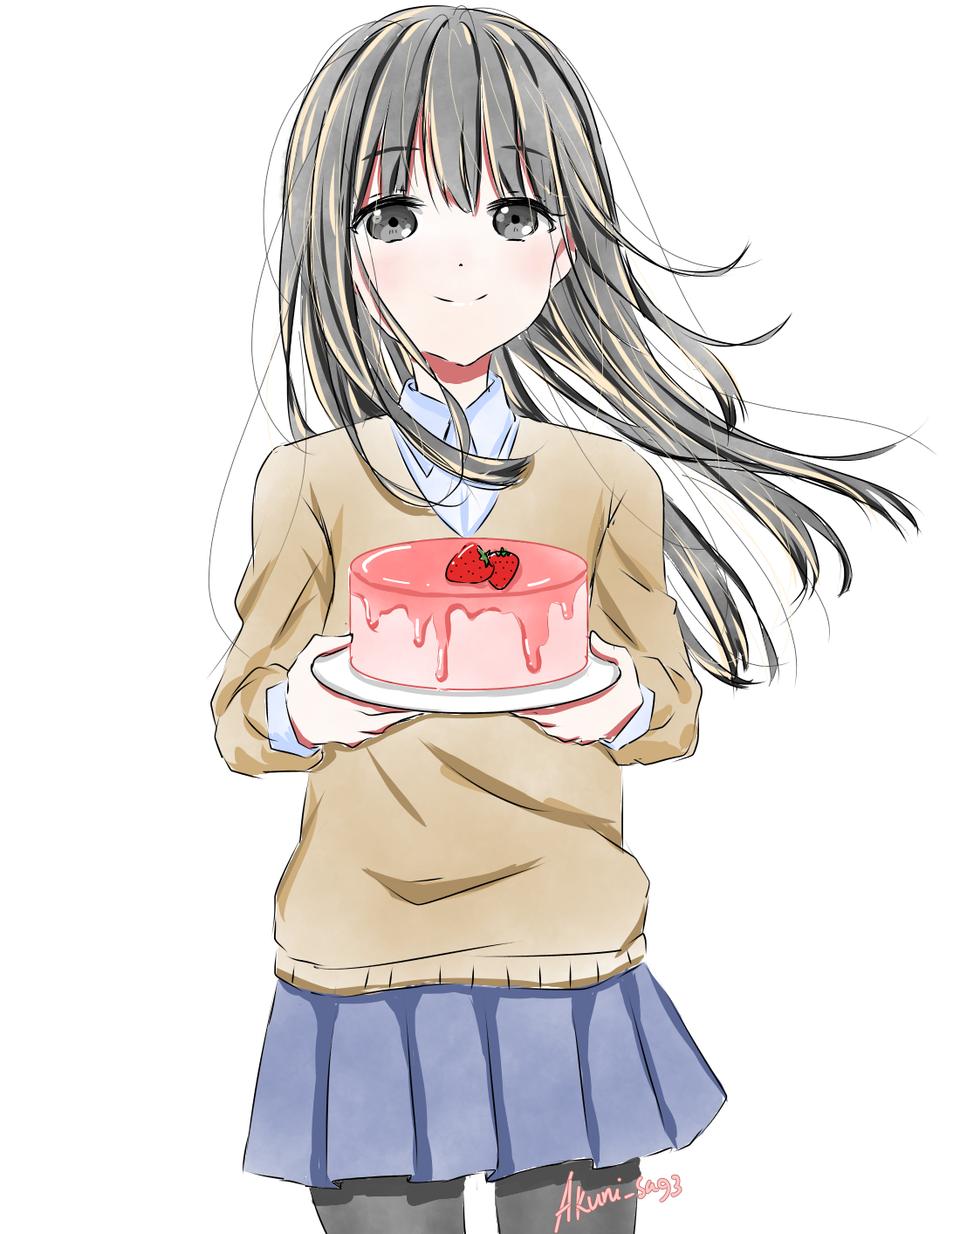 Happy birthday! (≡^∇^≡) Illust of Kanon medibangpaint anime girl birthday illustration animegirl